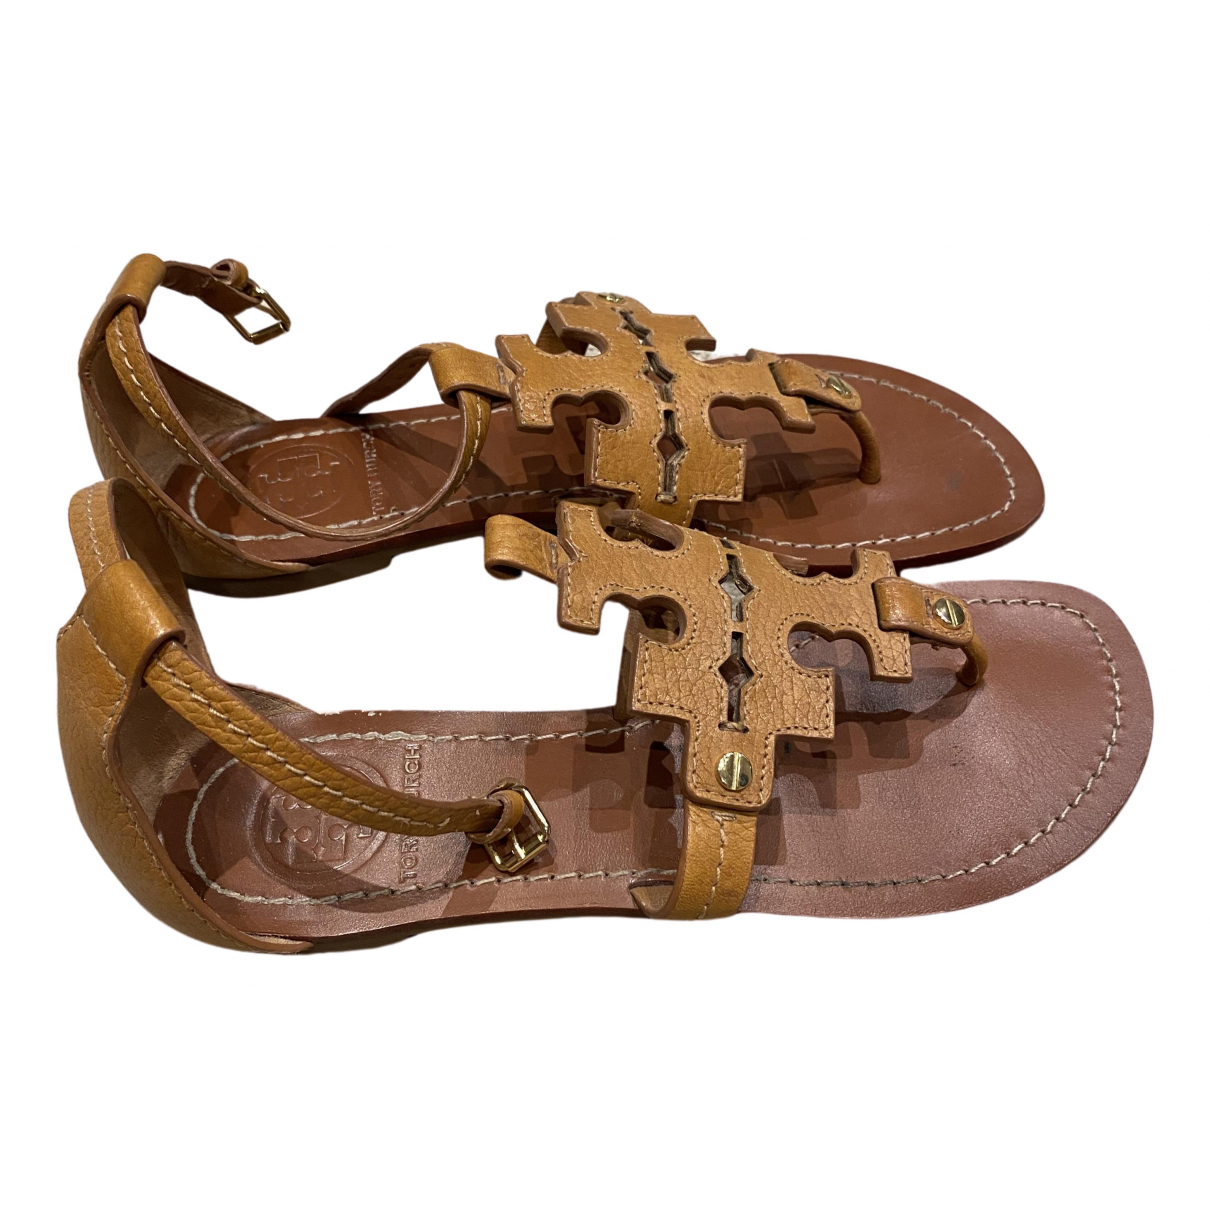 Sandalias romanas de Cuero Tory Burch